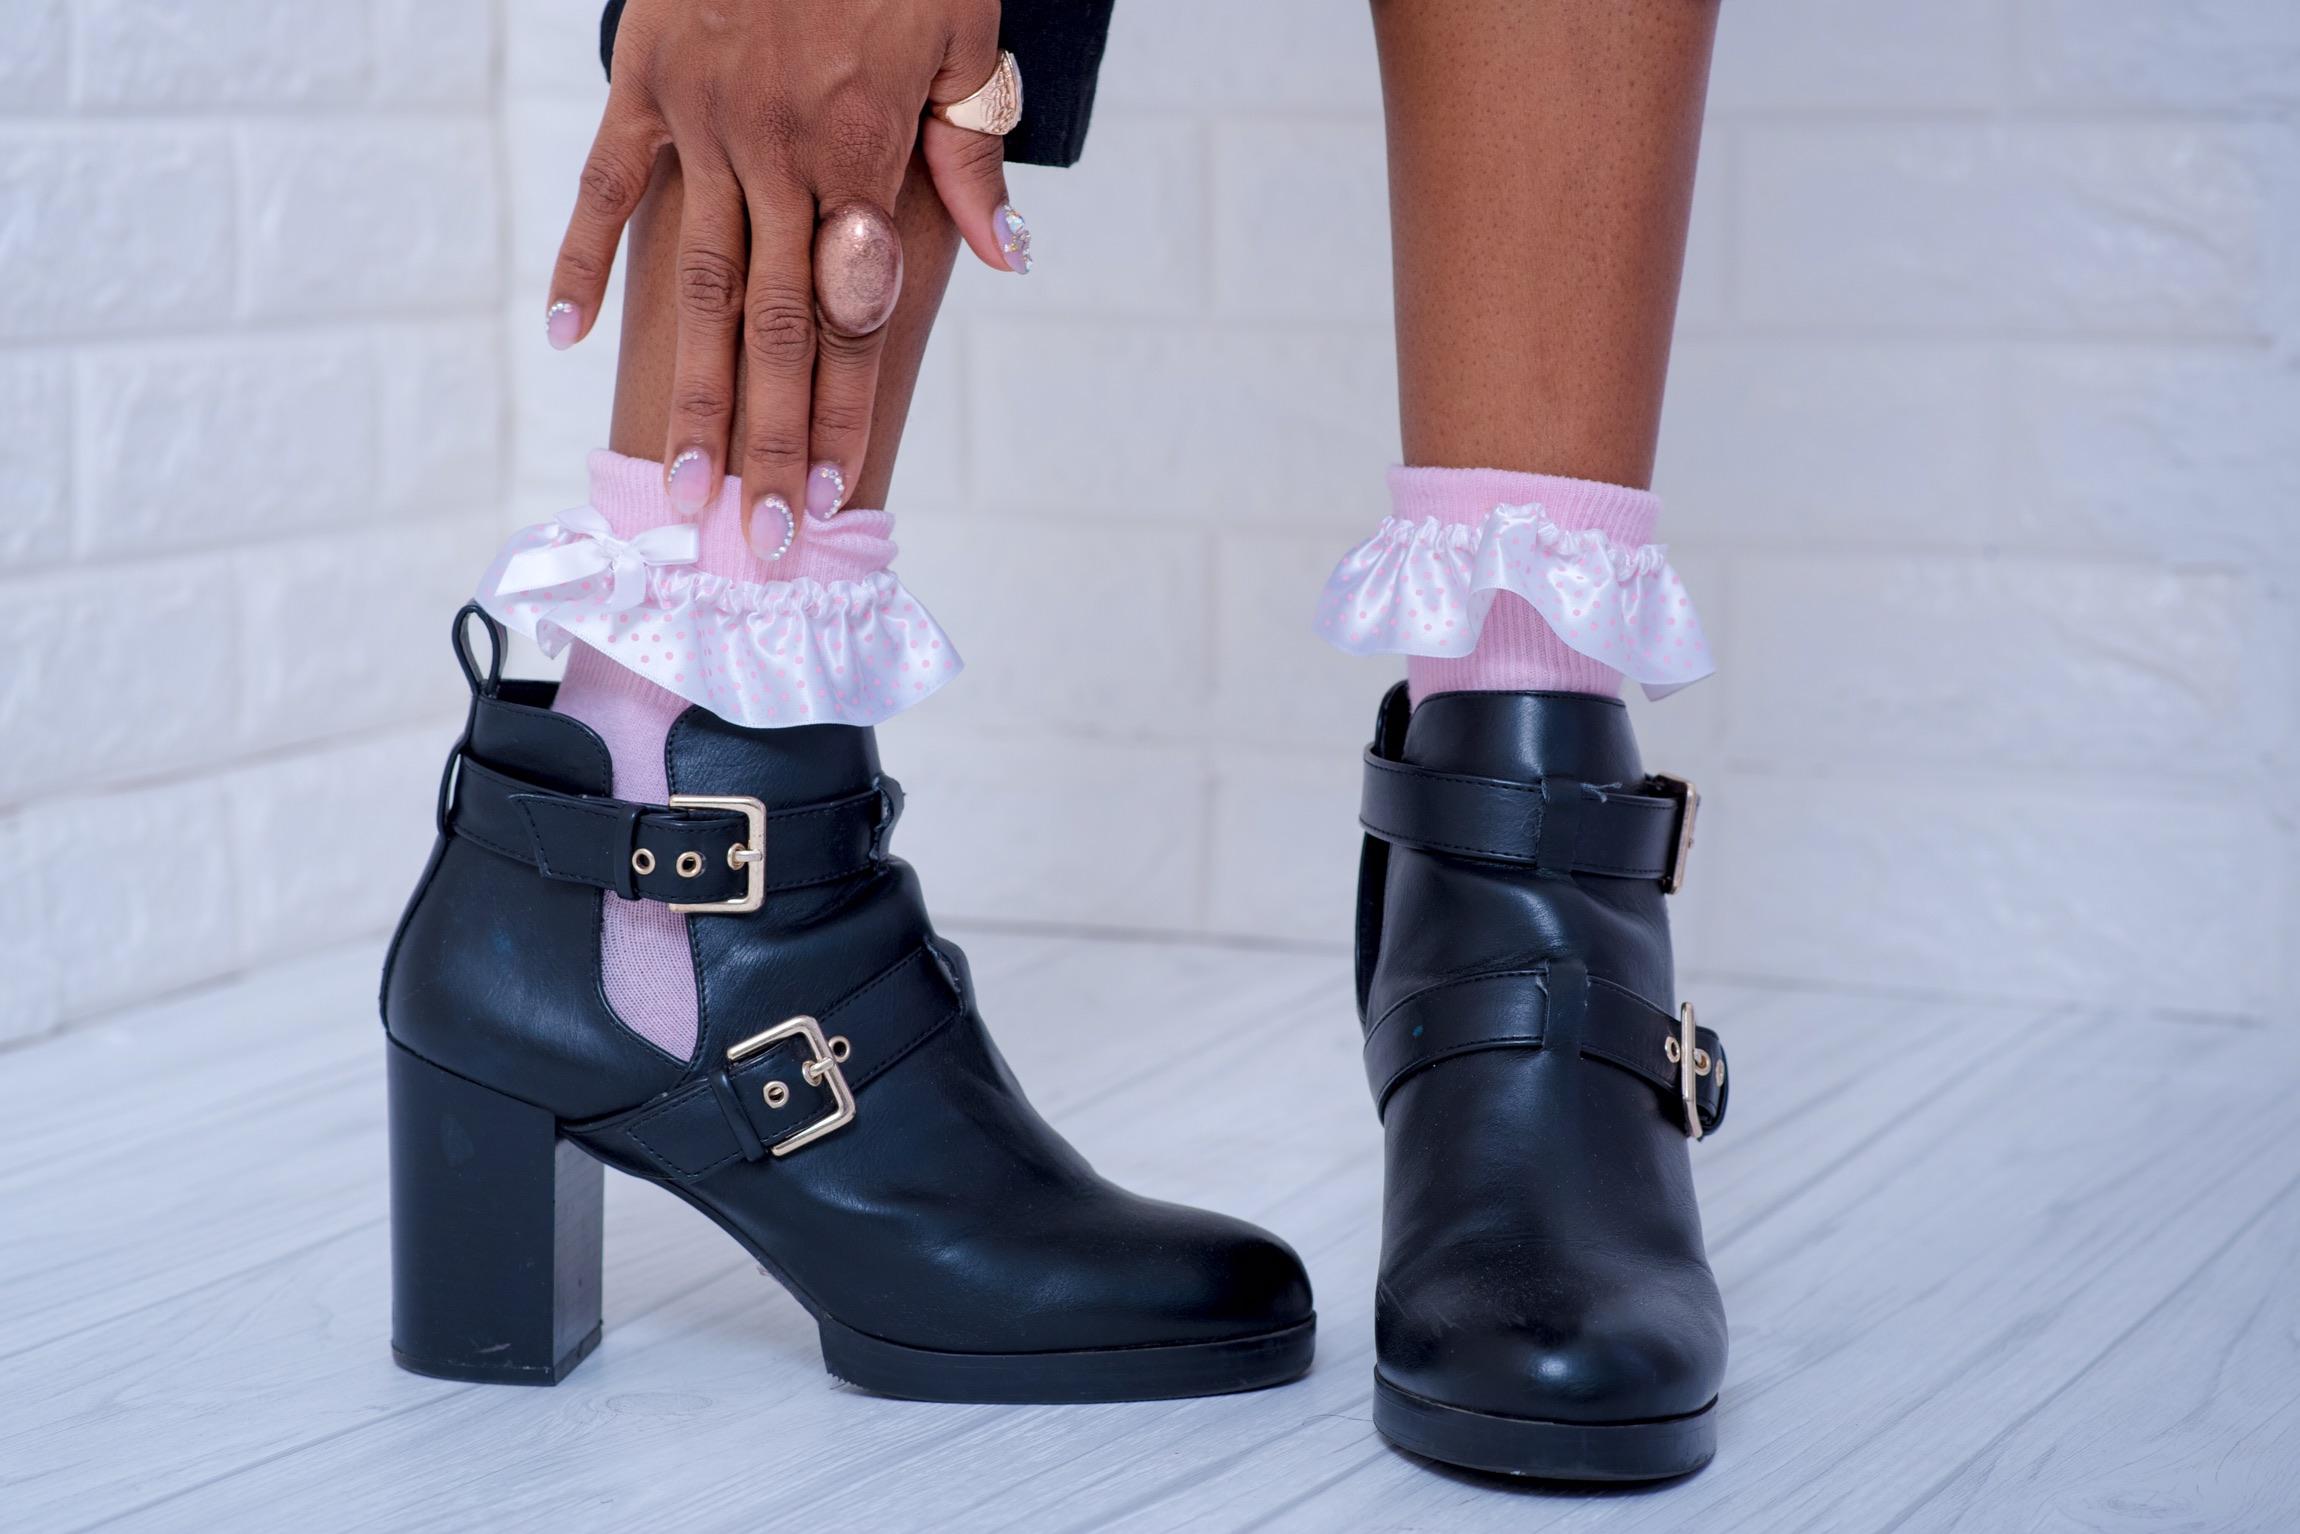 Look 3: Nails & Socks